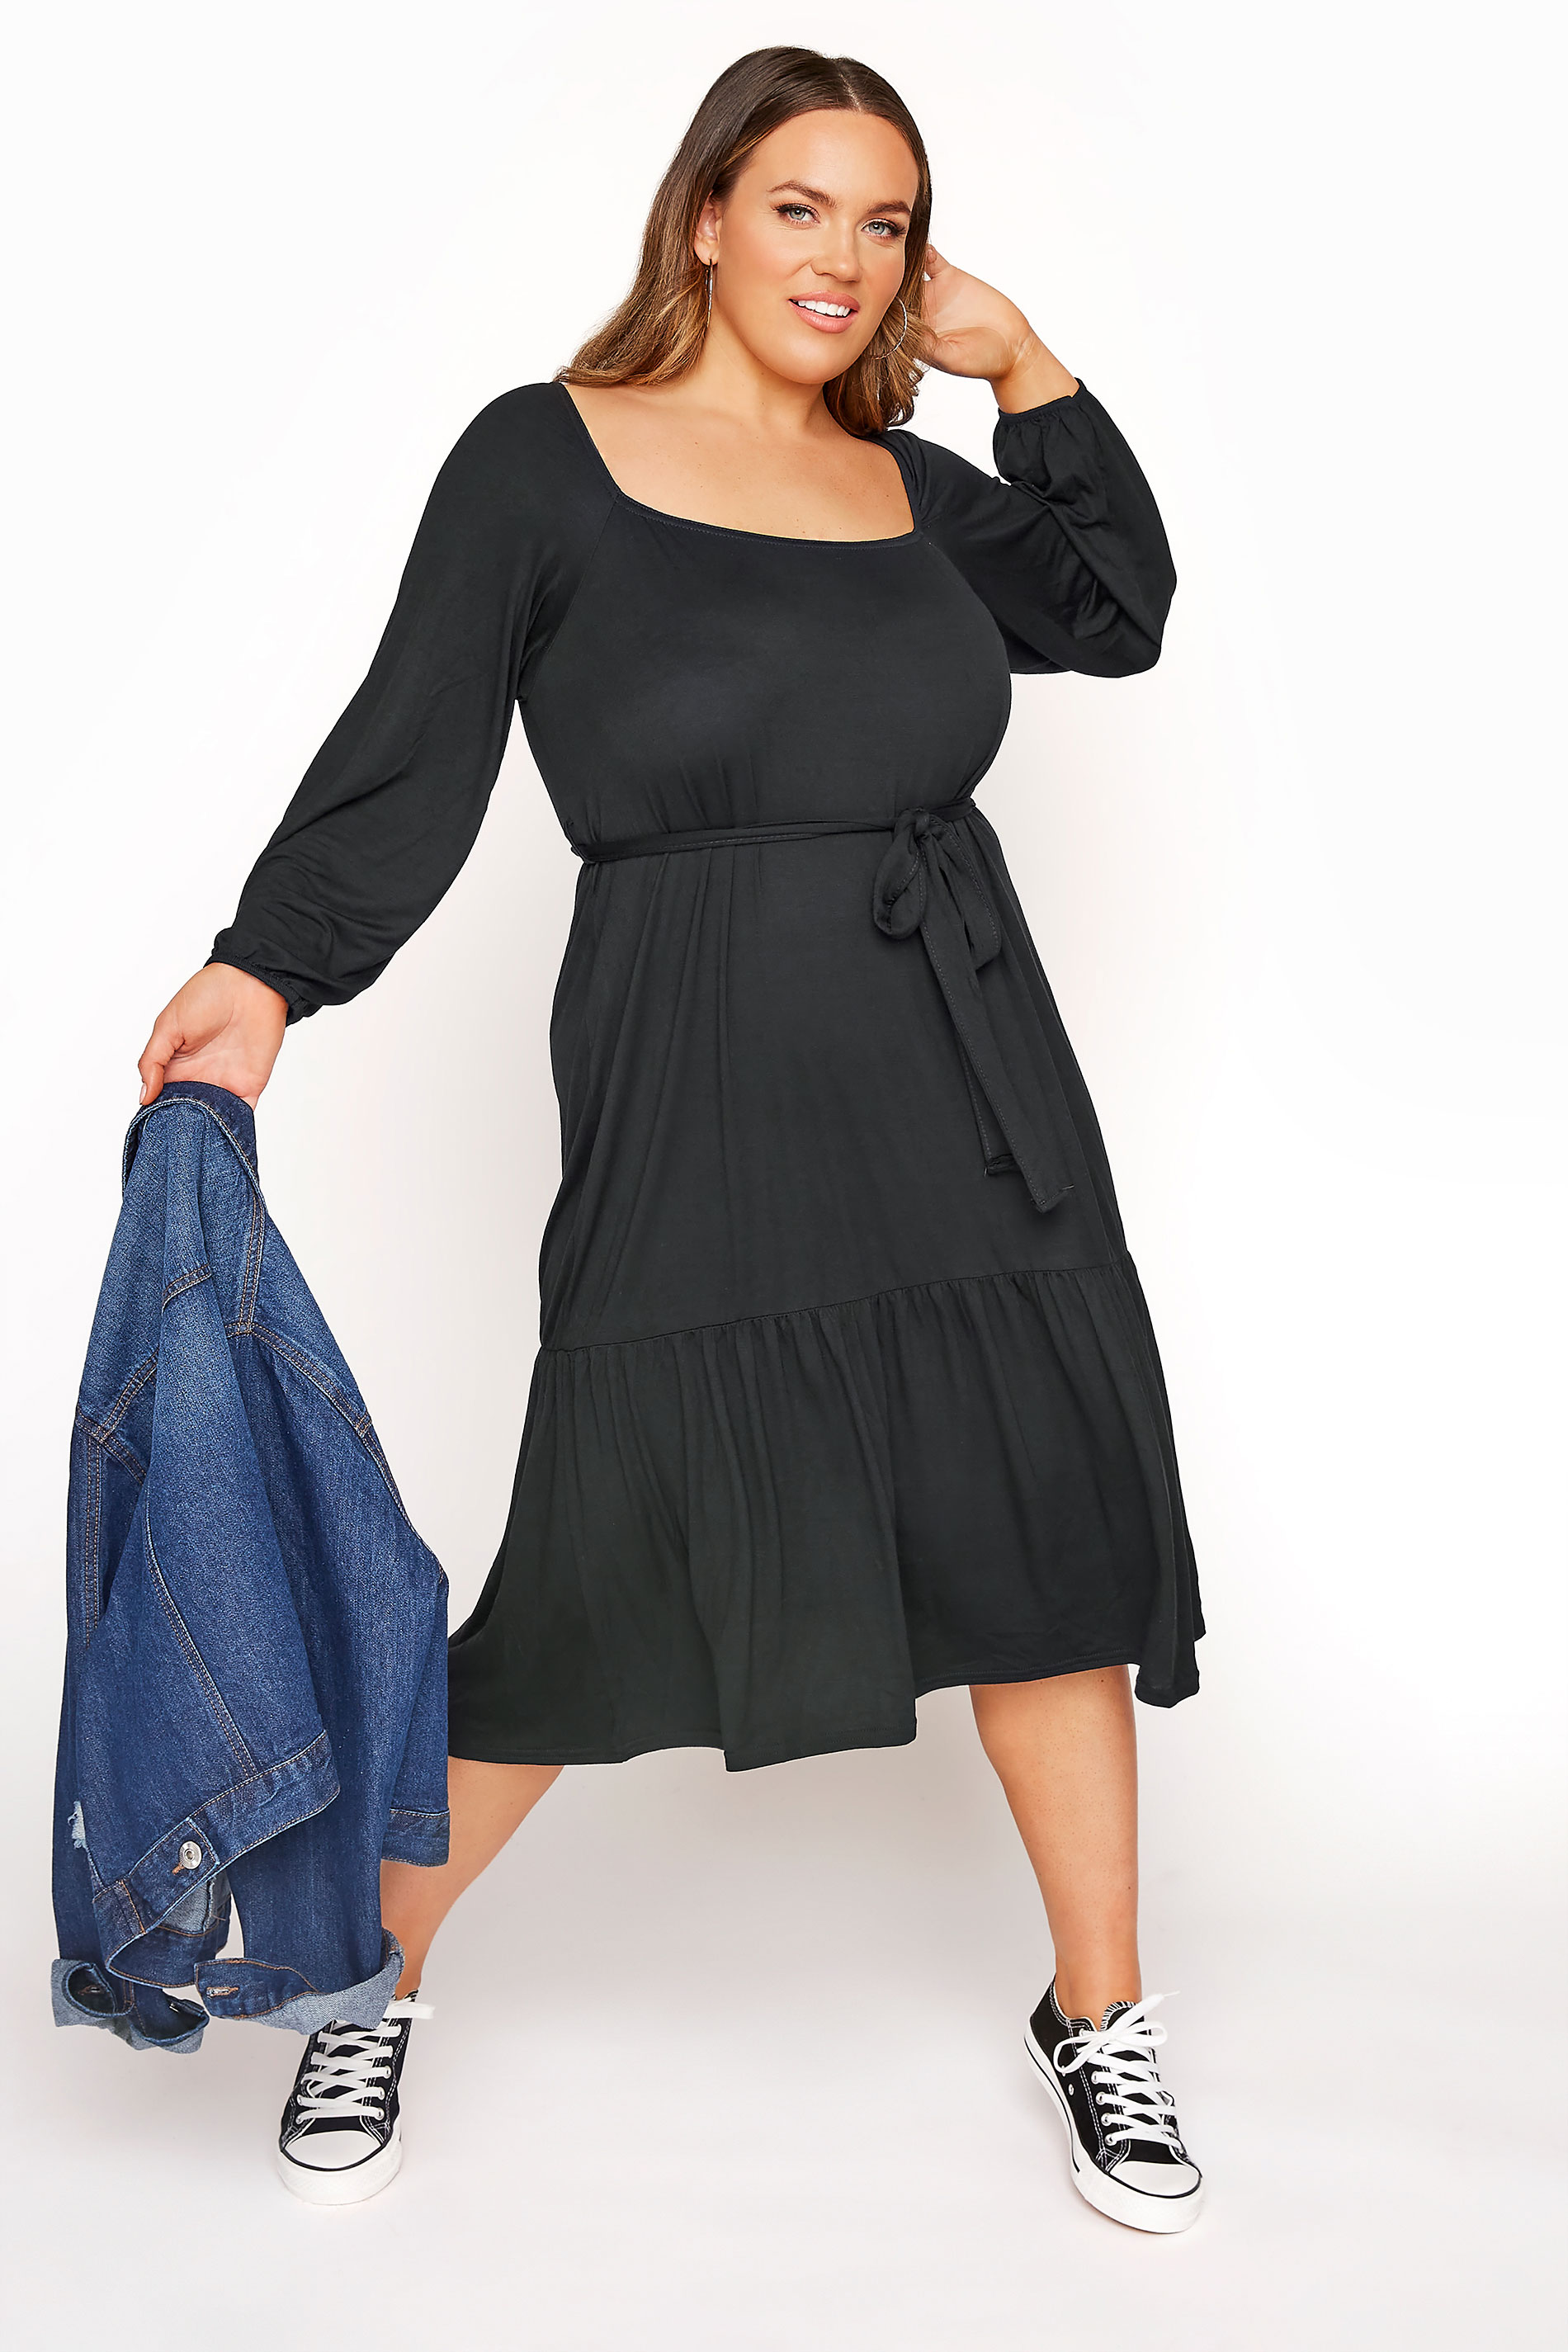 LIMITED COLLECTION Black Millkmaid Tiered Midi Dress_B.jpg